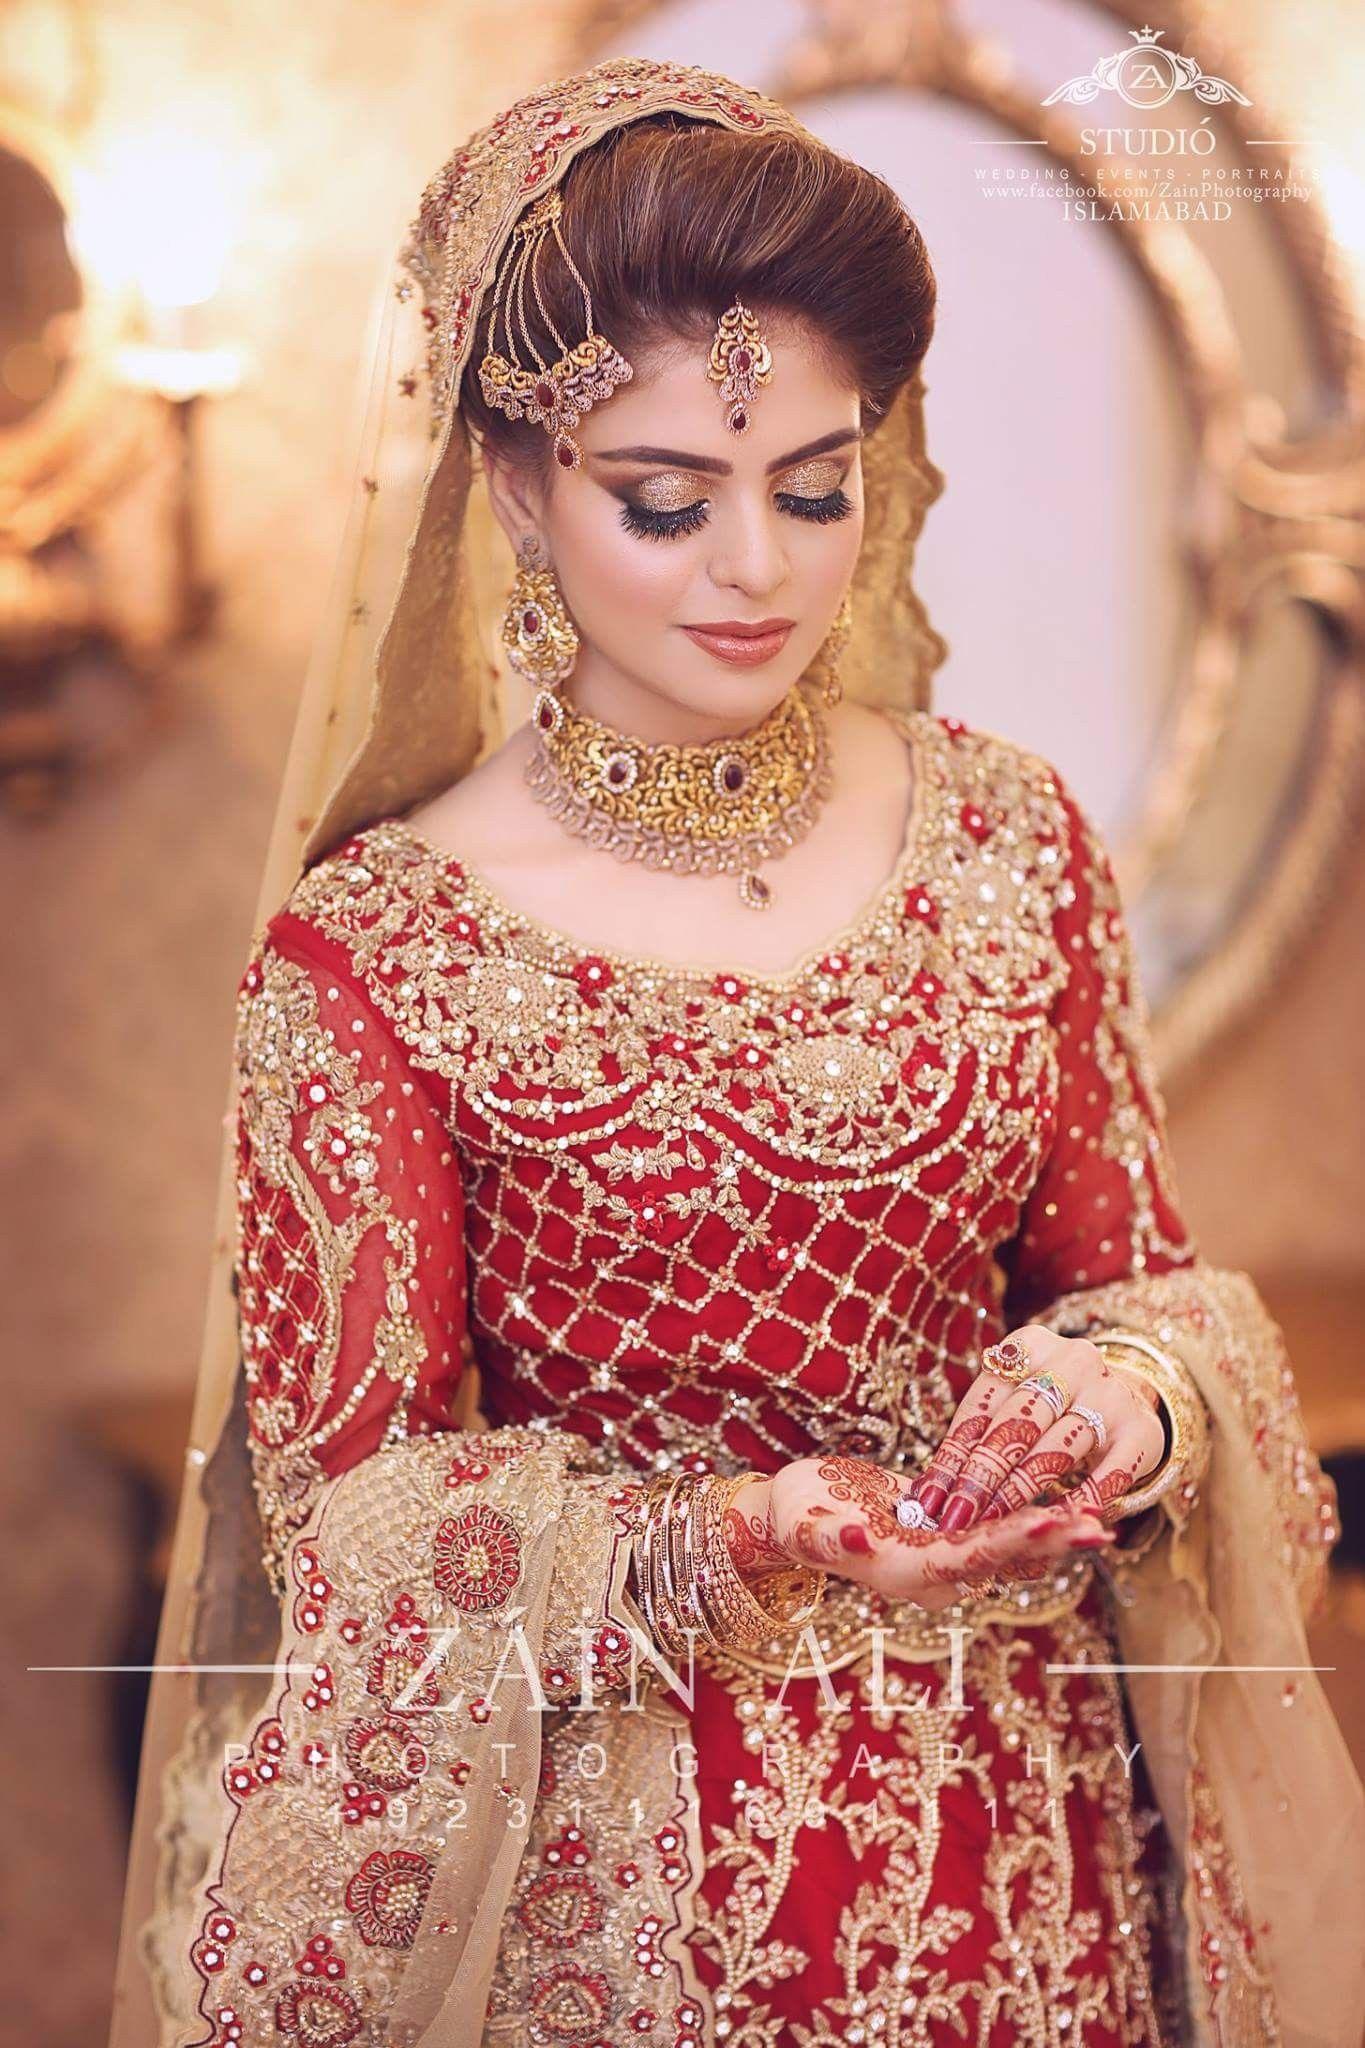 Asian Wedding Dress Beautiful Bride Dresses Moments Wear Fairytale Weddings Bridal Outfits Indian